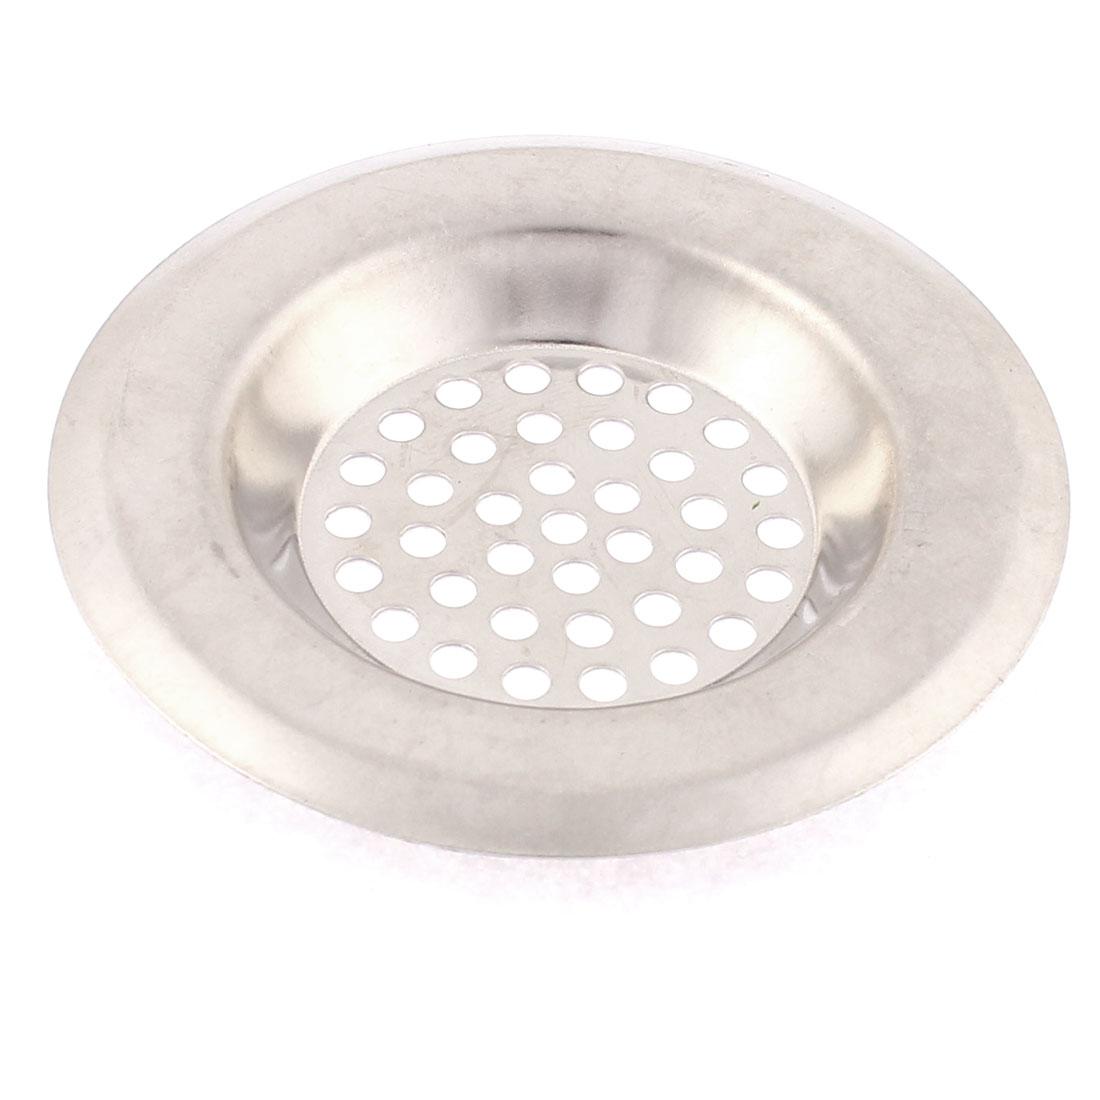 Bathroom Kitchen Metal Sink Waste Strainer Drainer Filter Stopper 6.5cm Dia